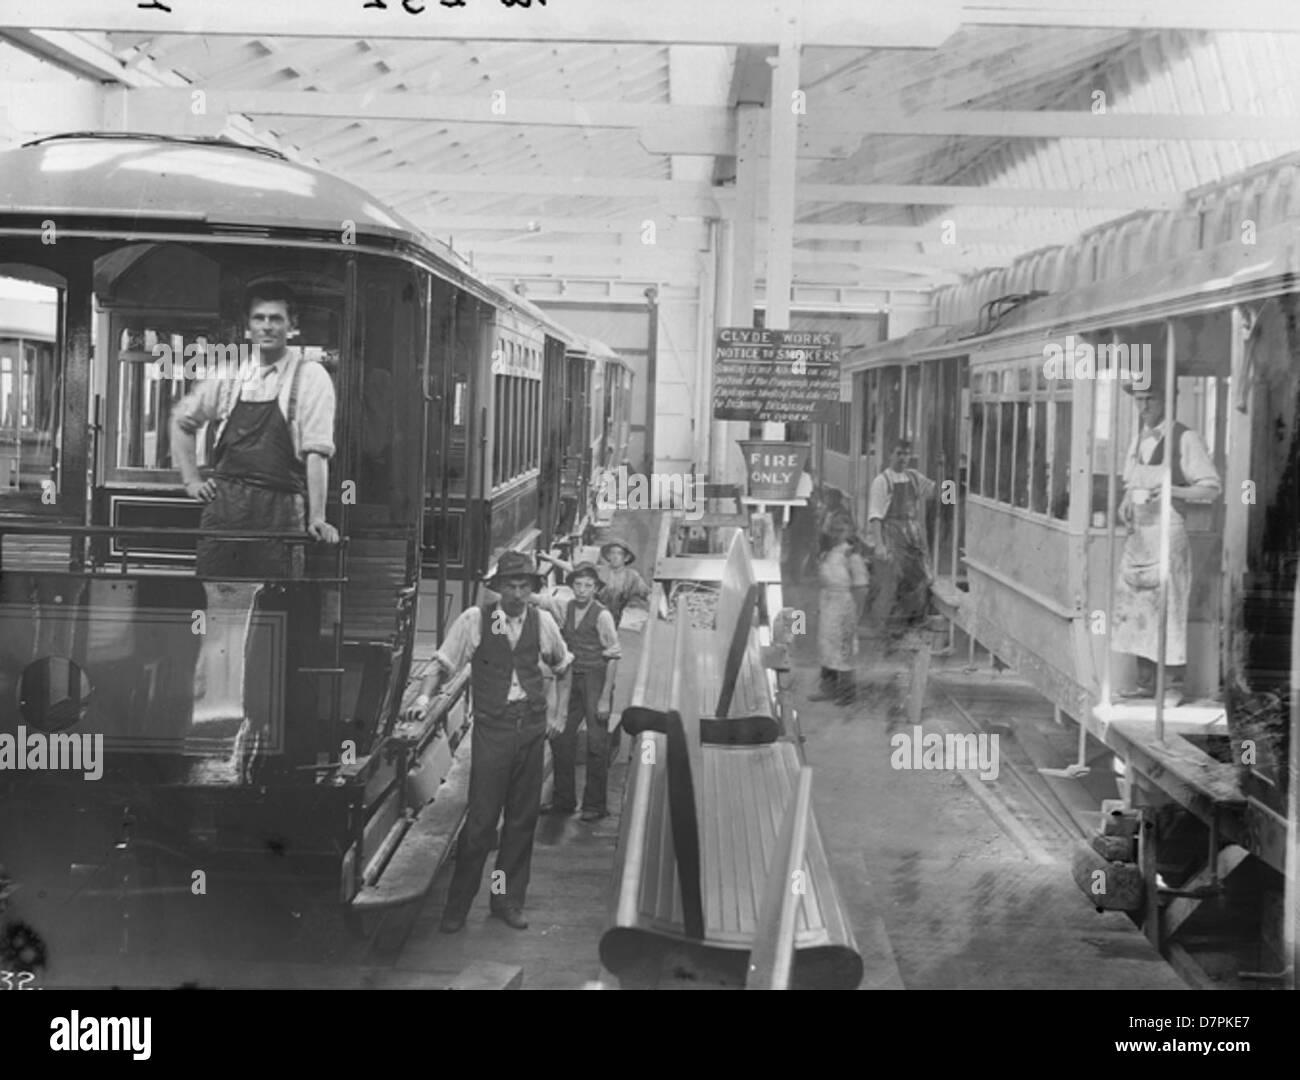 Workmen constructing Sydney tram cars - Stock Image